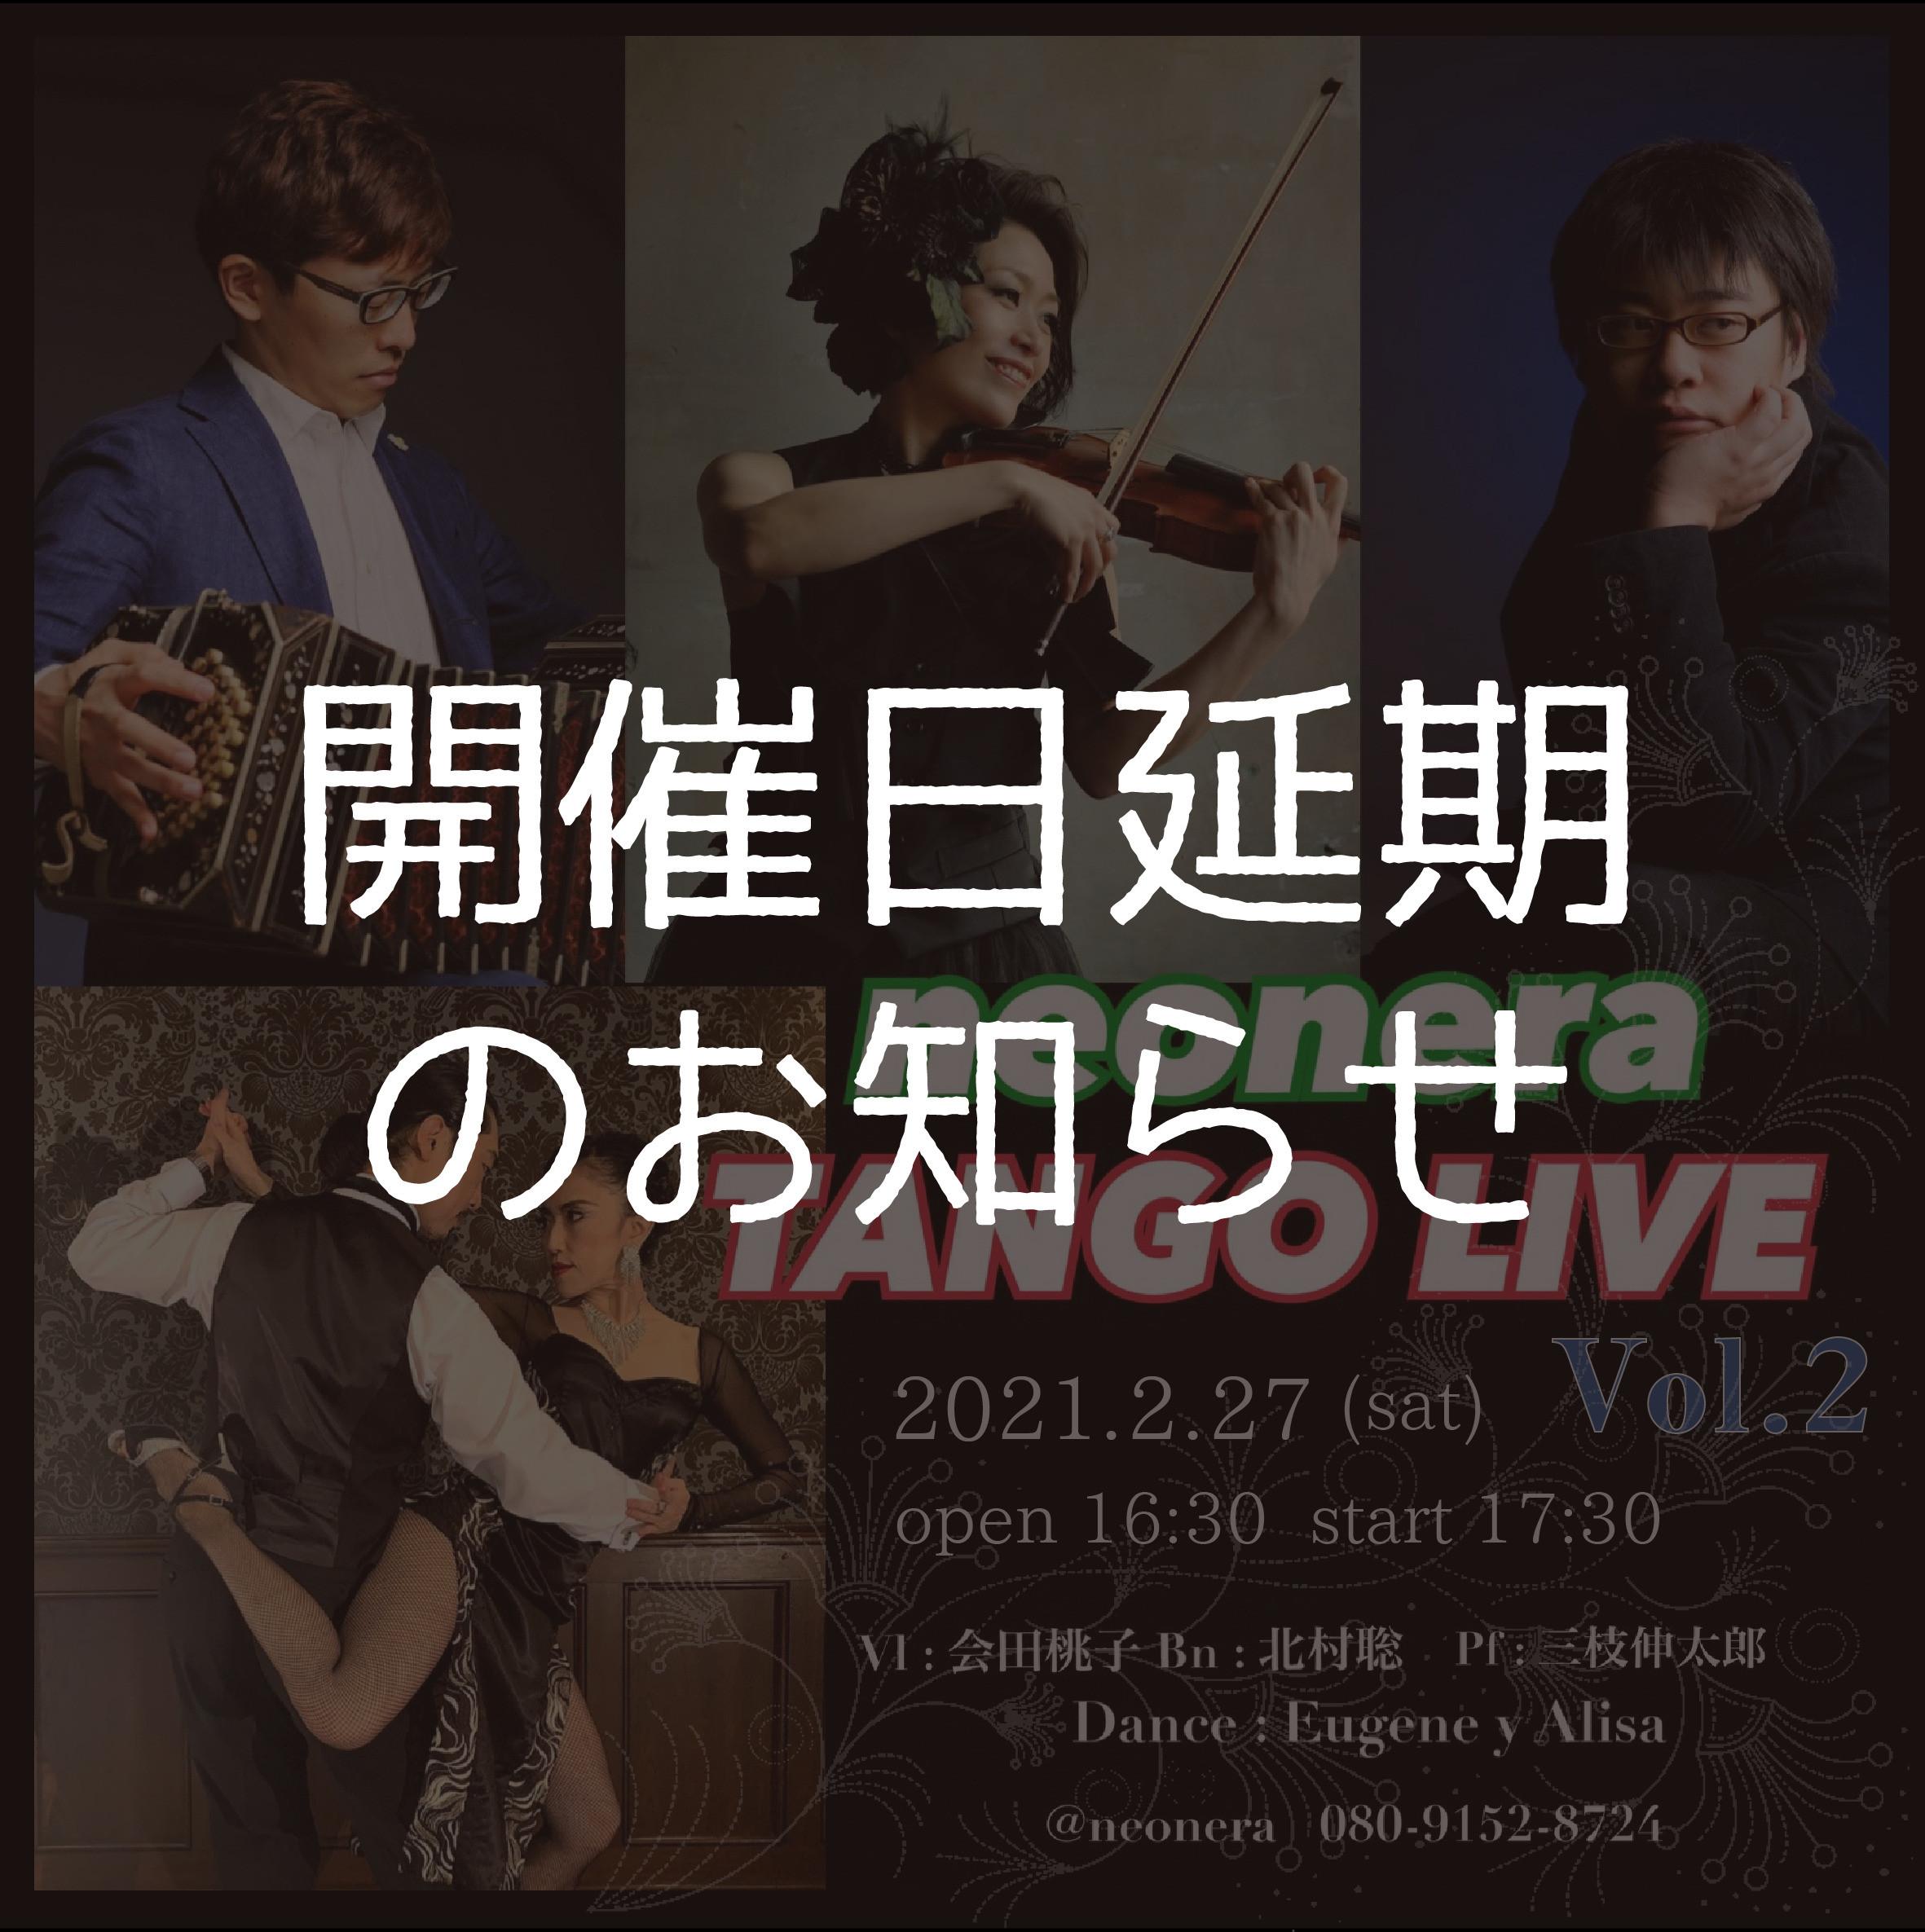 2月27日(土)neonera TANGO LIVE Vol.2